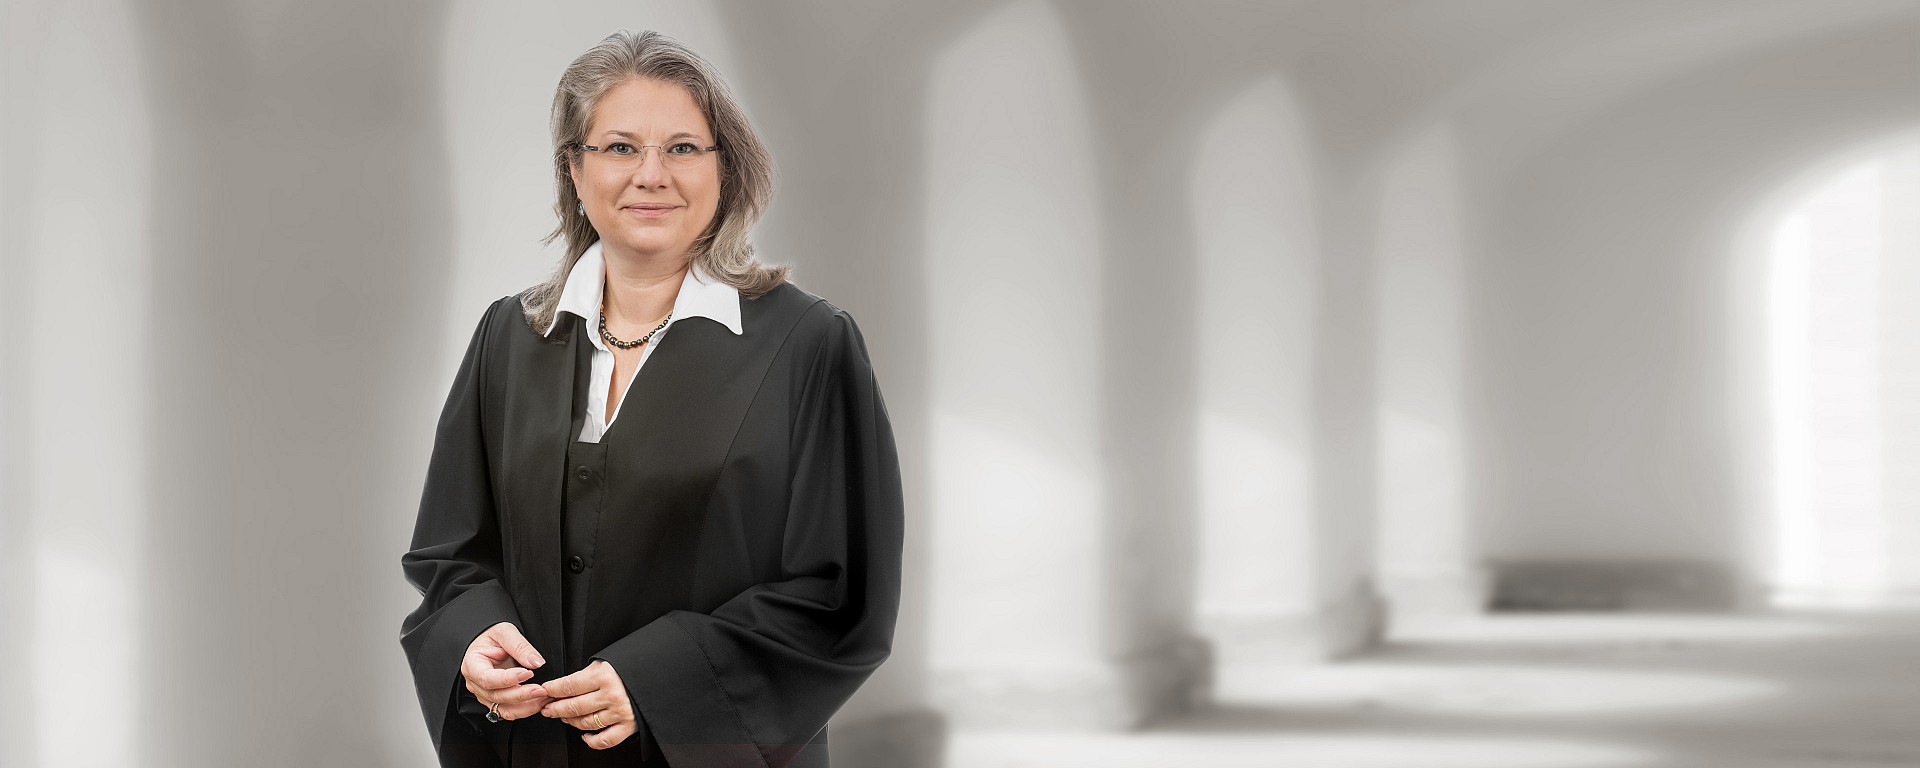 Victoria Riedel - Schöner Erben